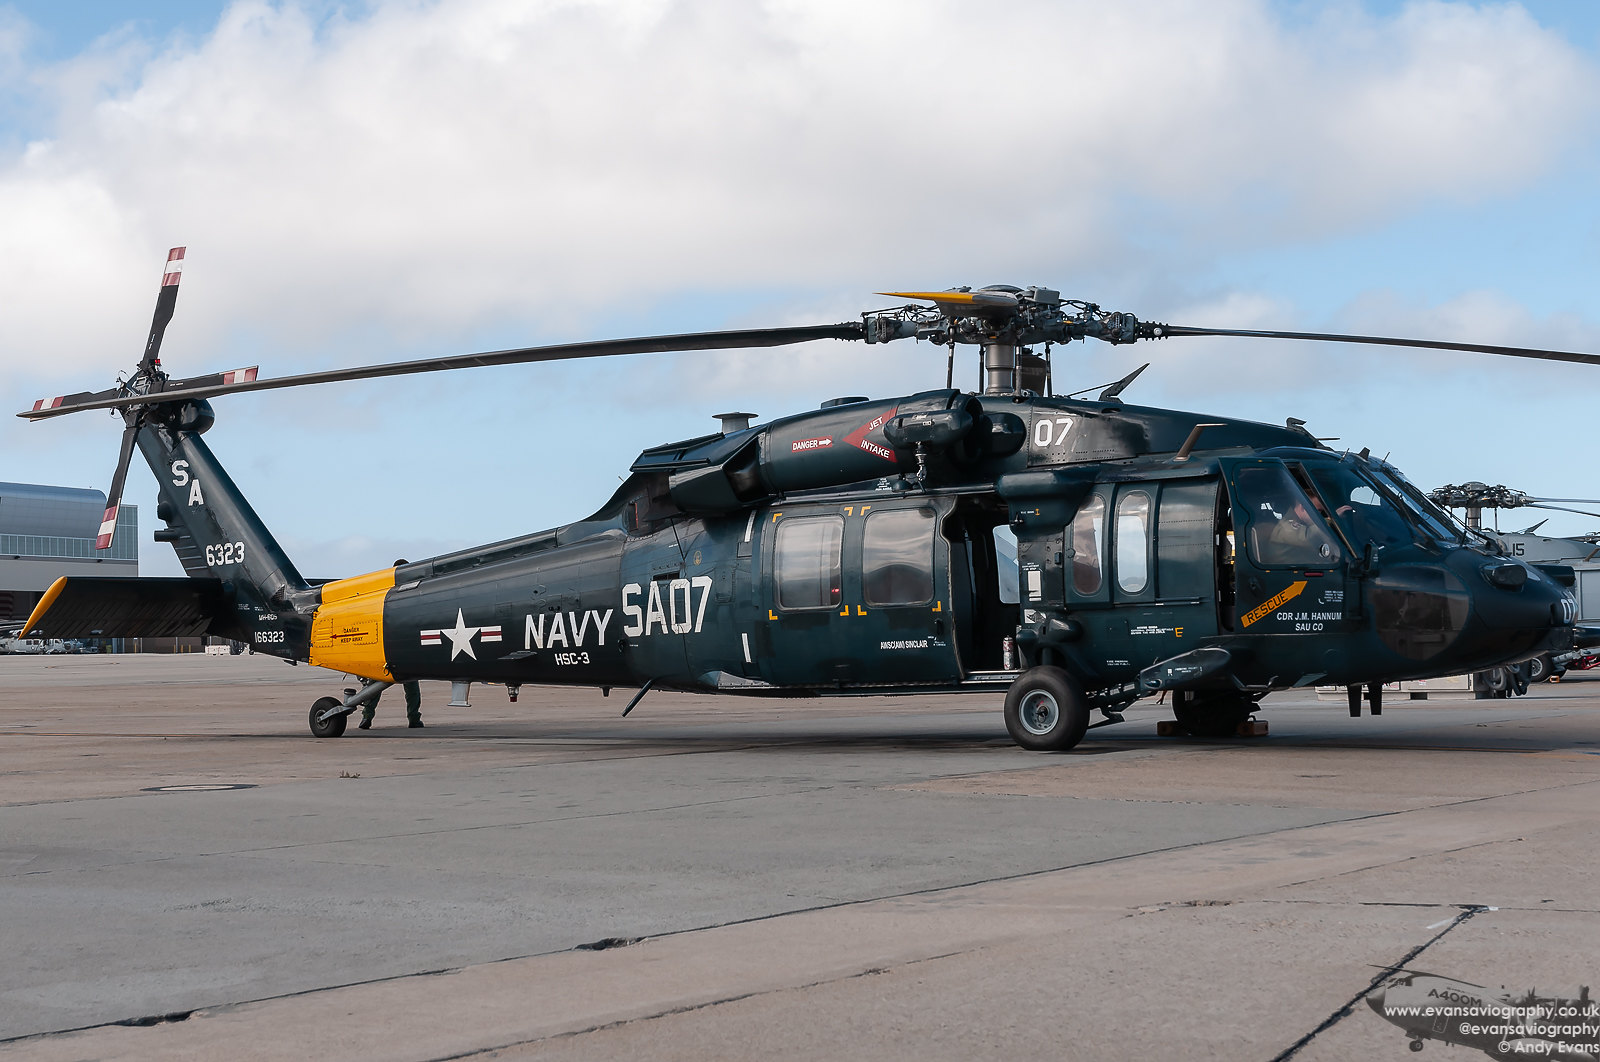 166323 MH-60S HSC-3